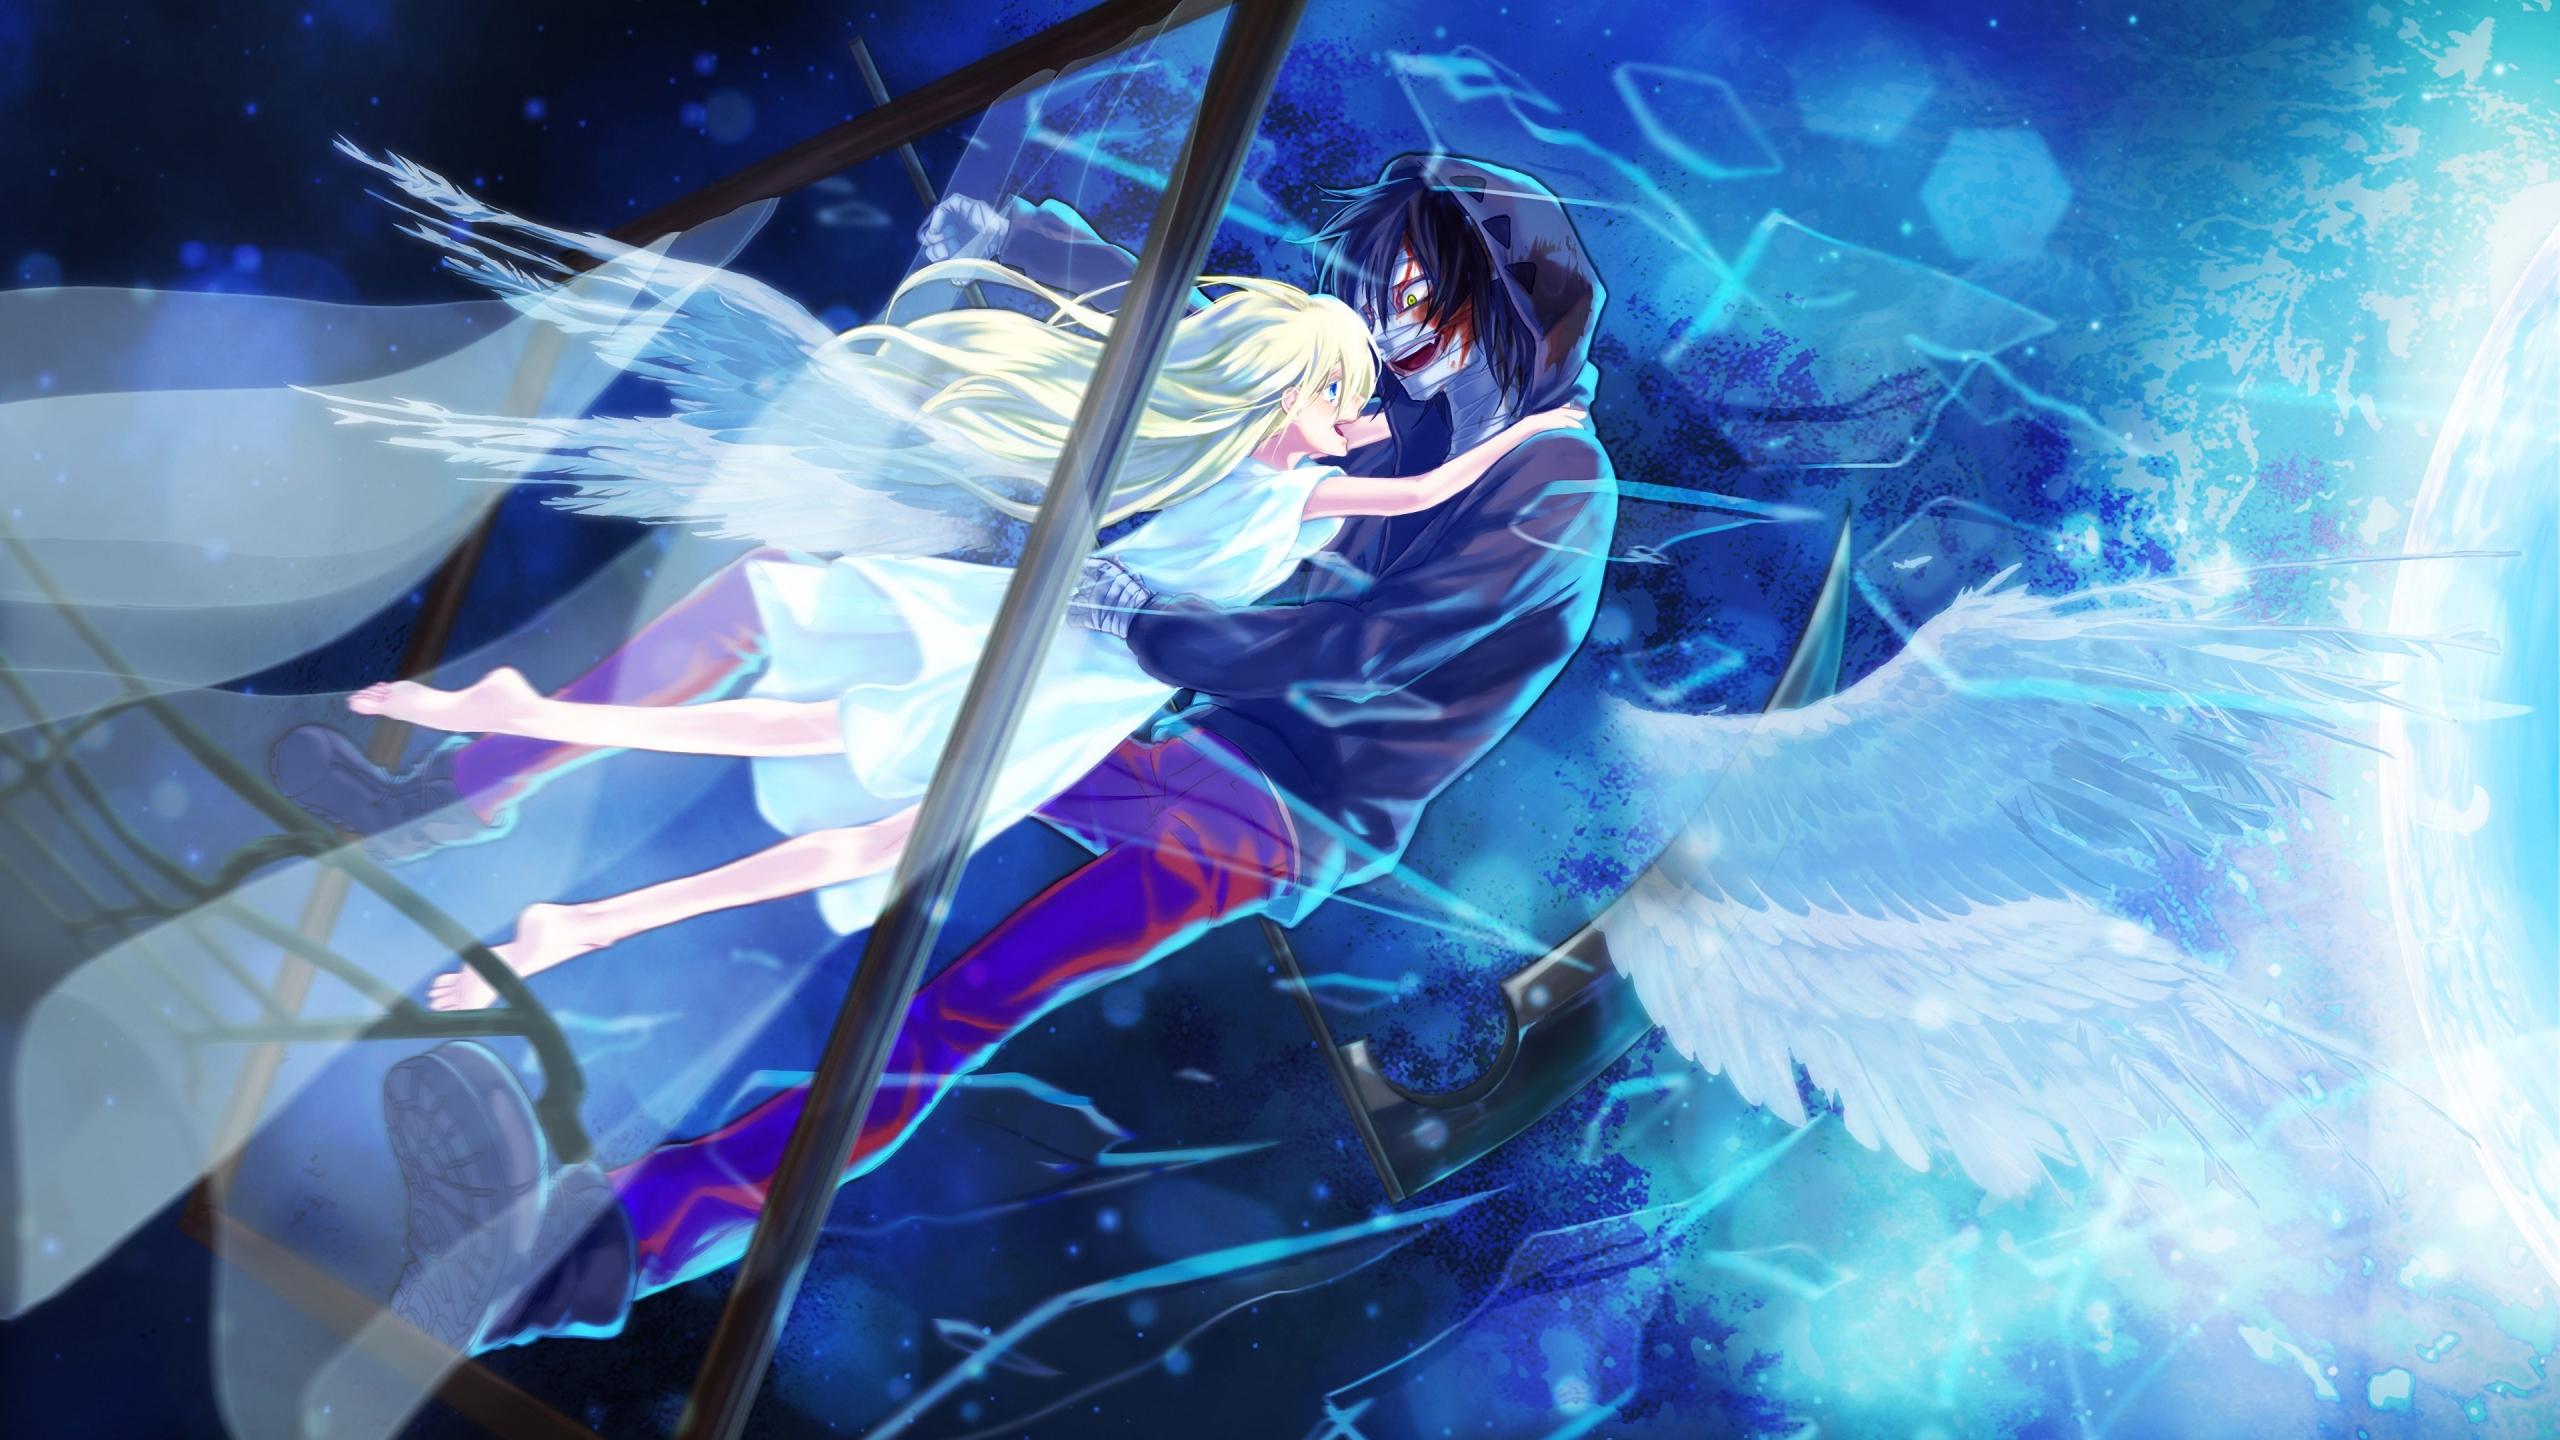 Download 2560x1440 Wallpaper Anime Rachel Gardner And Zack Couple Dual Wide Widescreen 16 9 Widescreen 2560x1440 Hd Image Background 10378